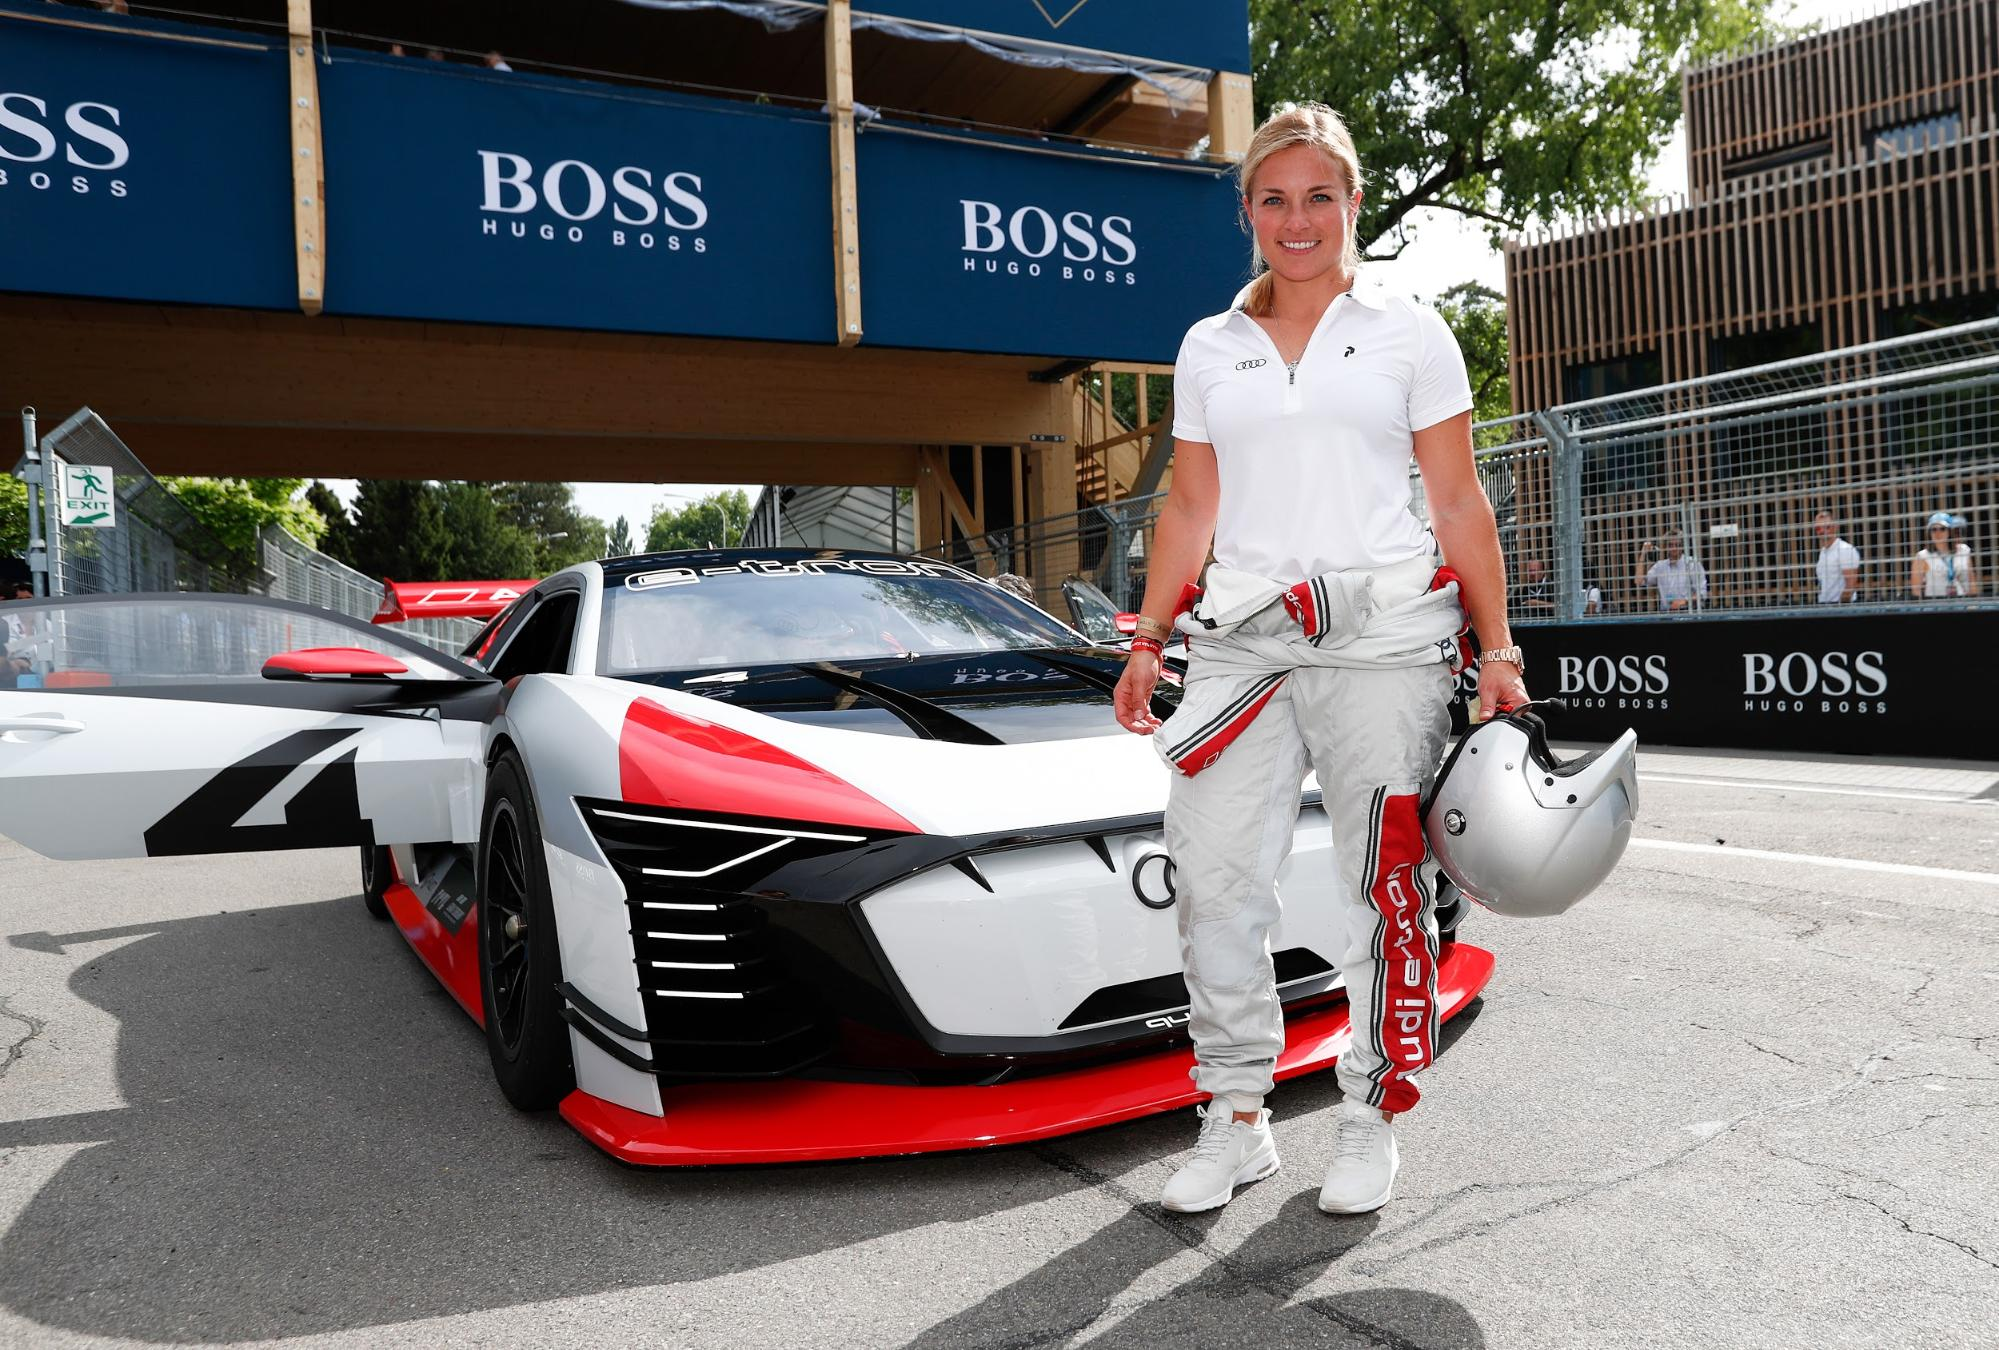 Lara Gut-Behrami am Rande des Zürcher E-Prix 2018 vor dem Audi e-tron Vision Gran Turismo. (Sven Thomann)